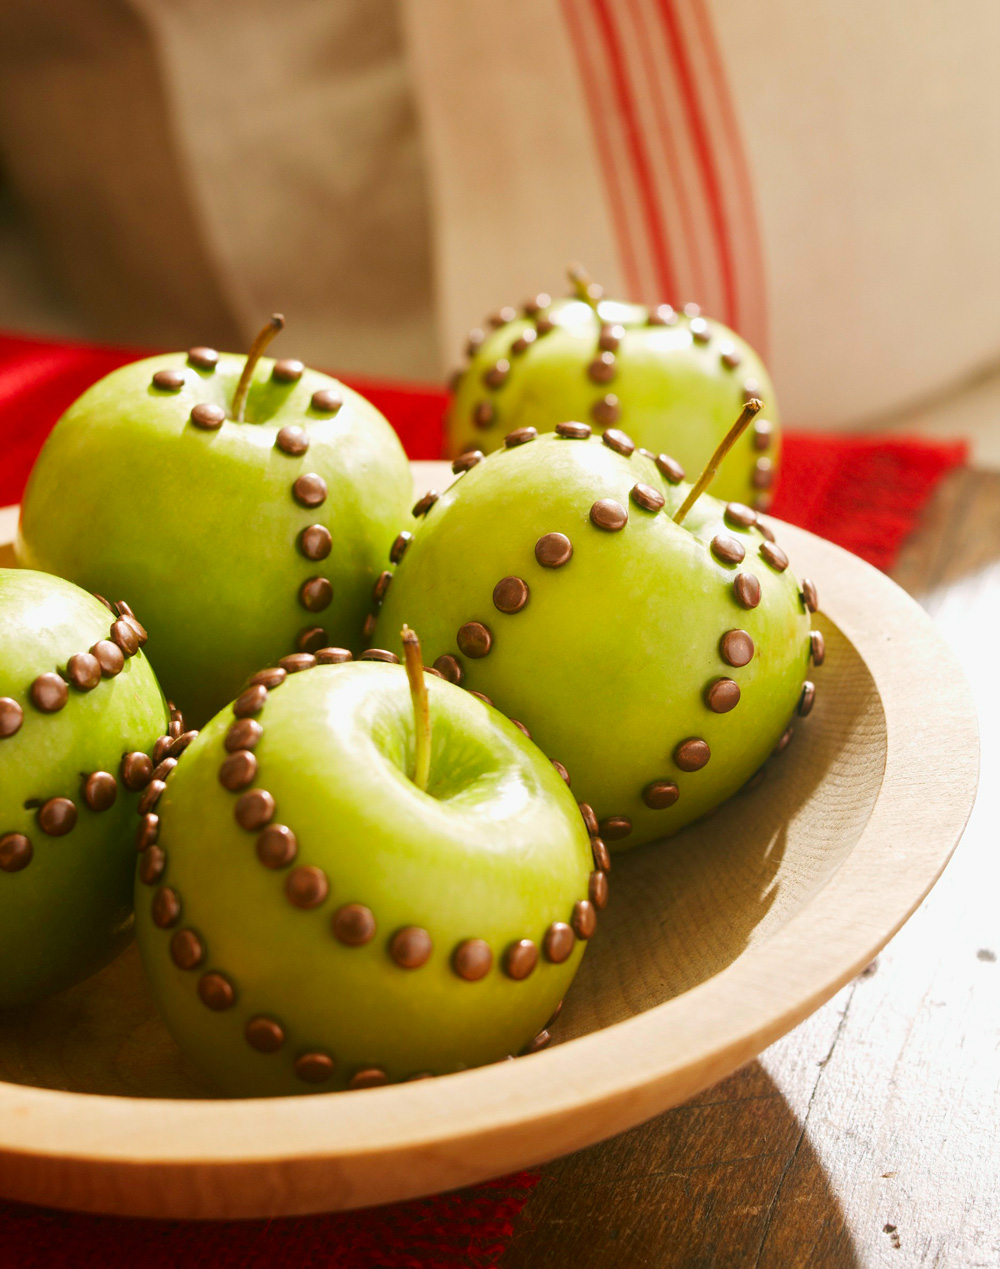 Dress up fruit